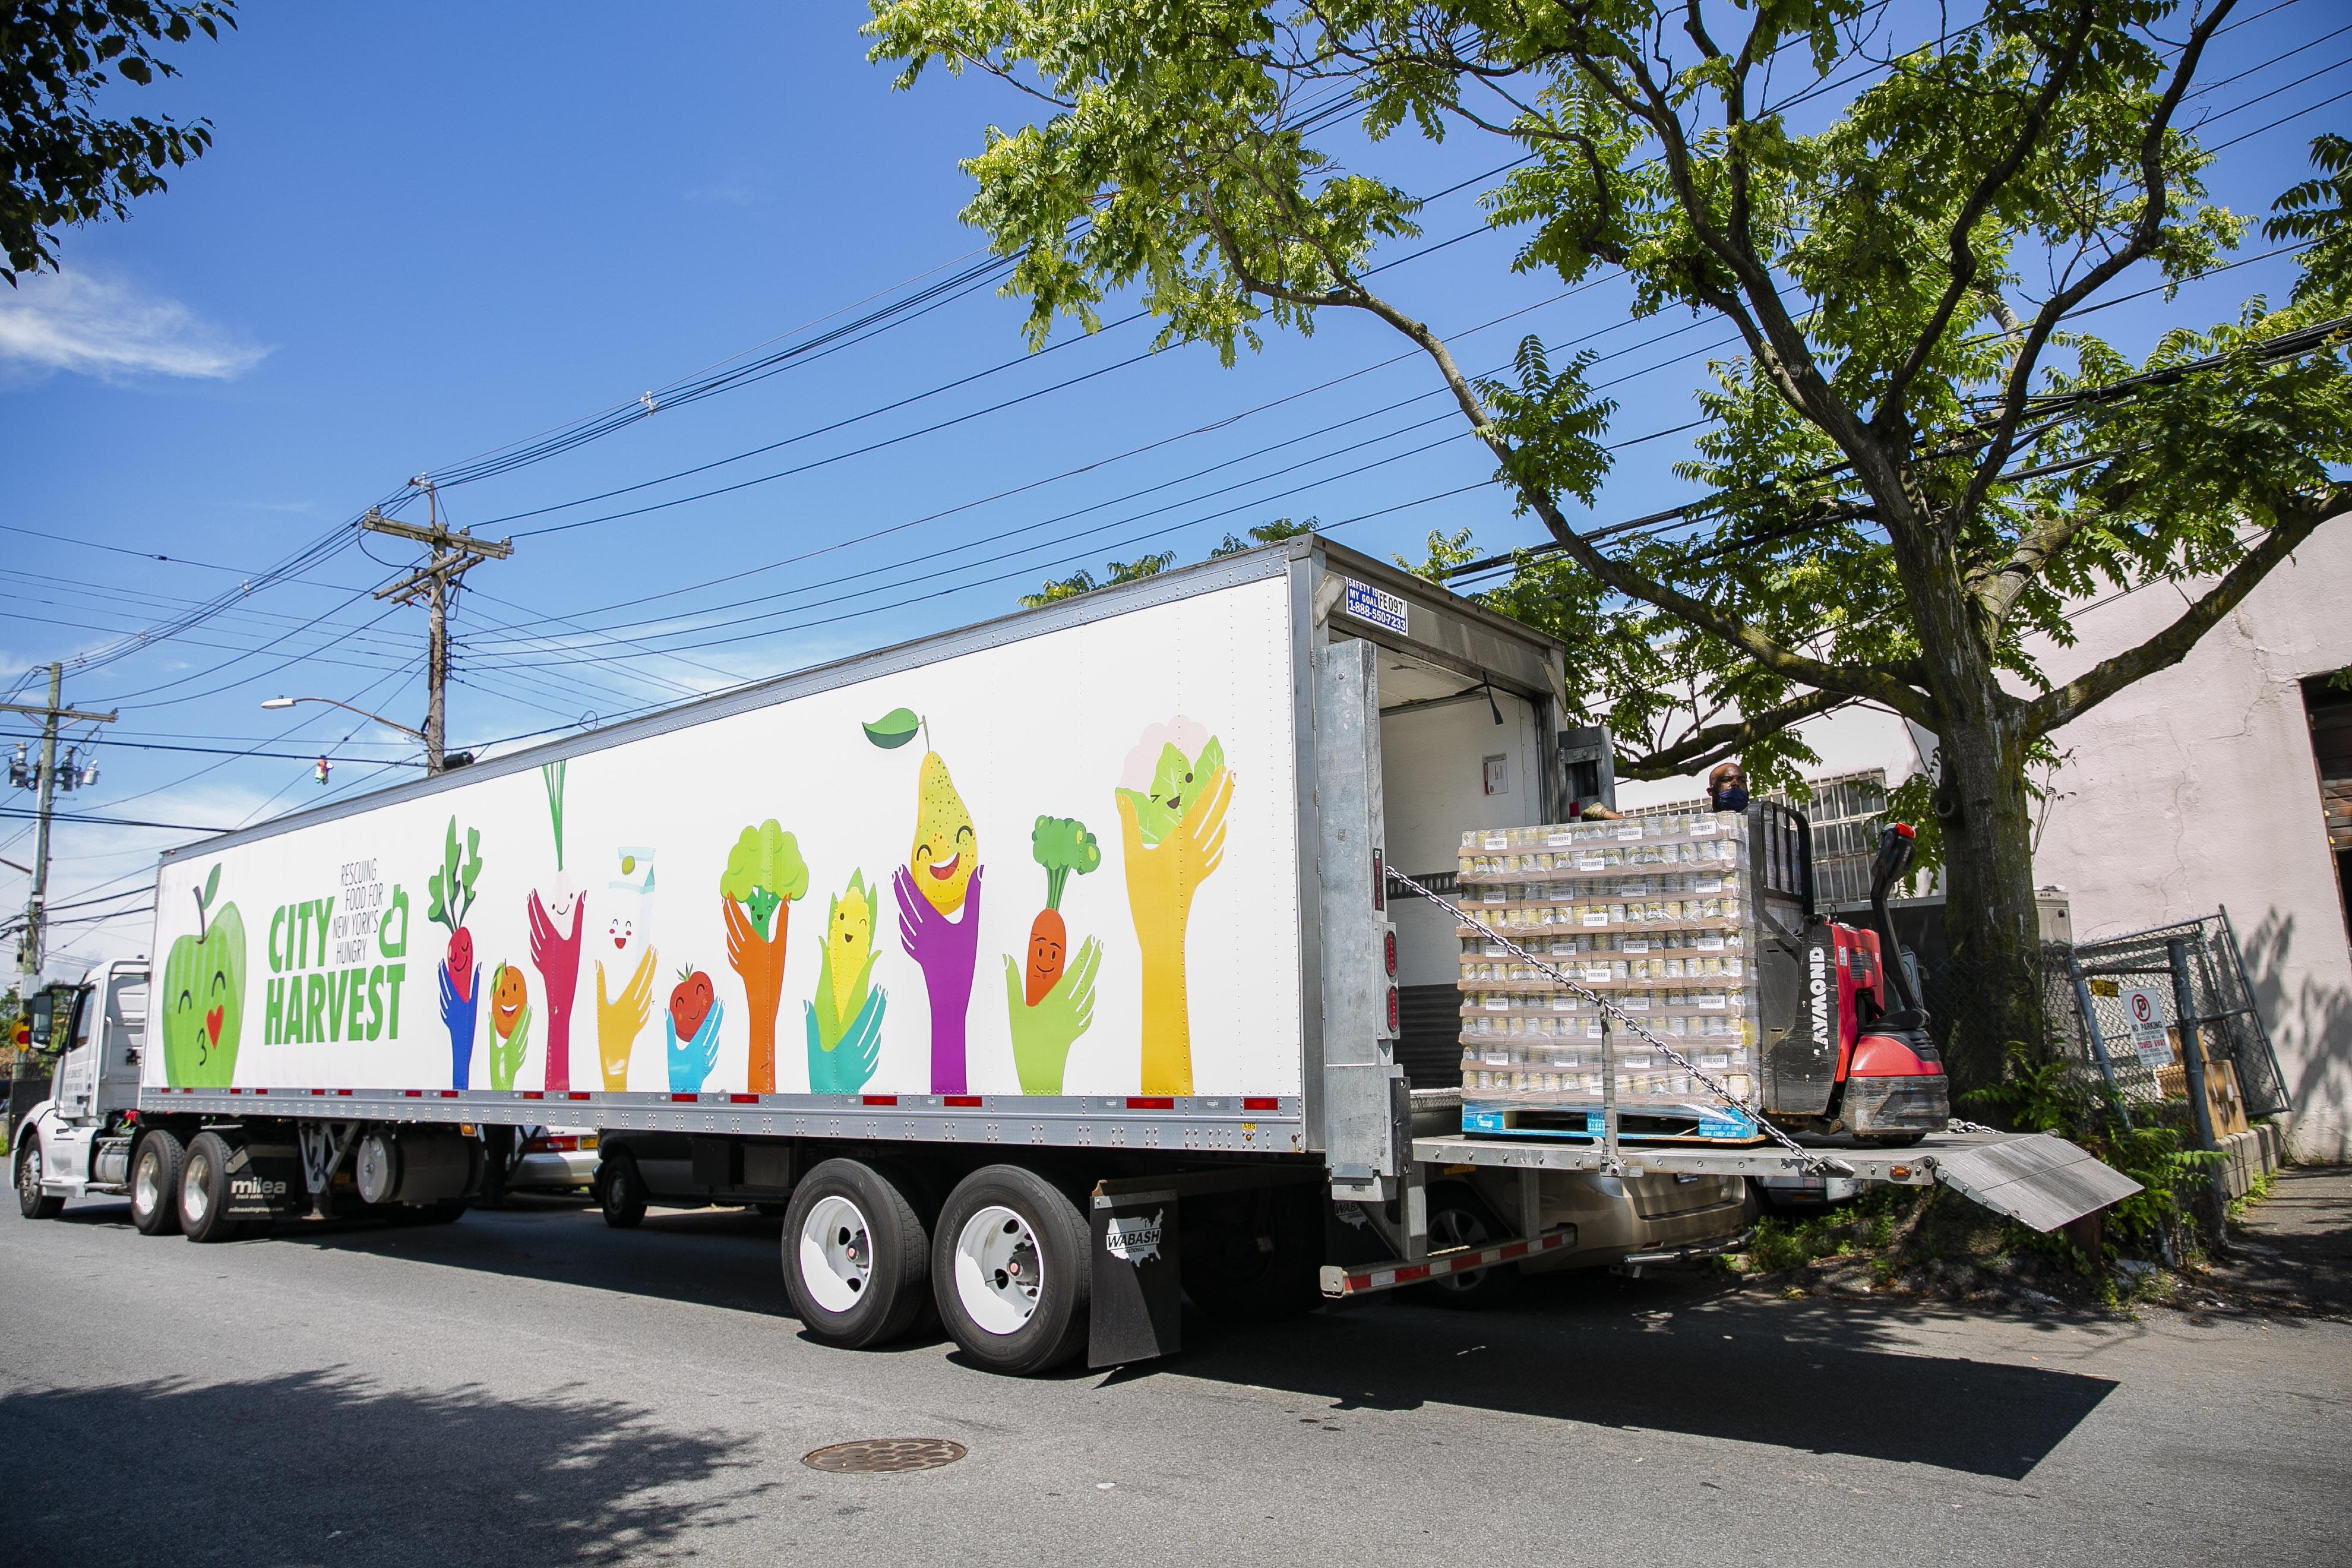 City Harvest truck